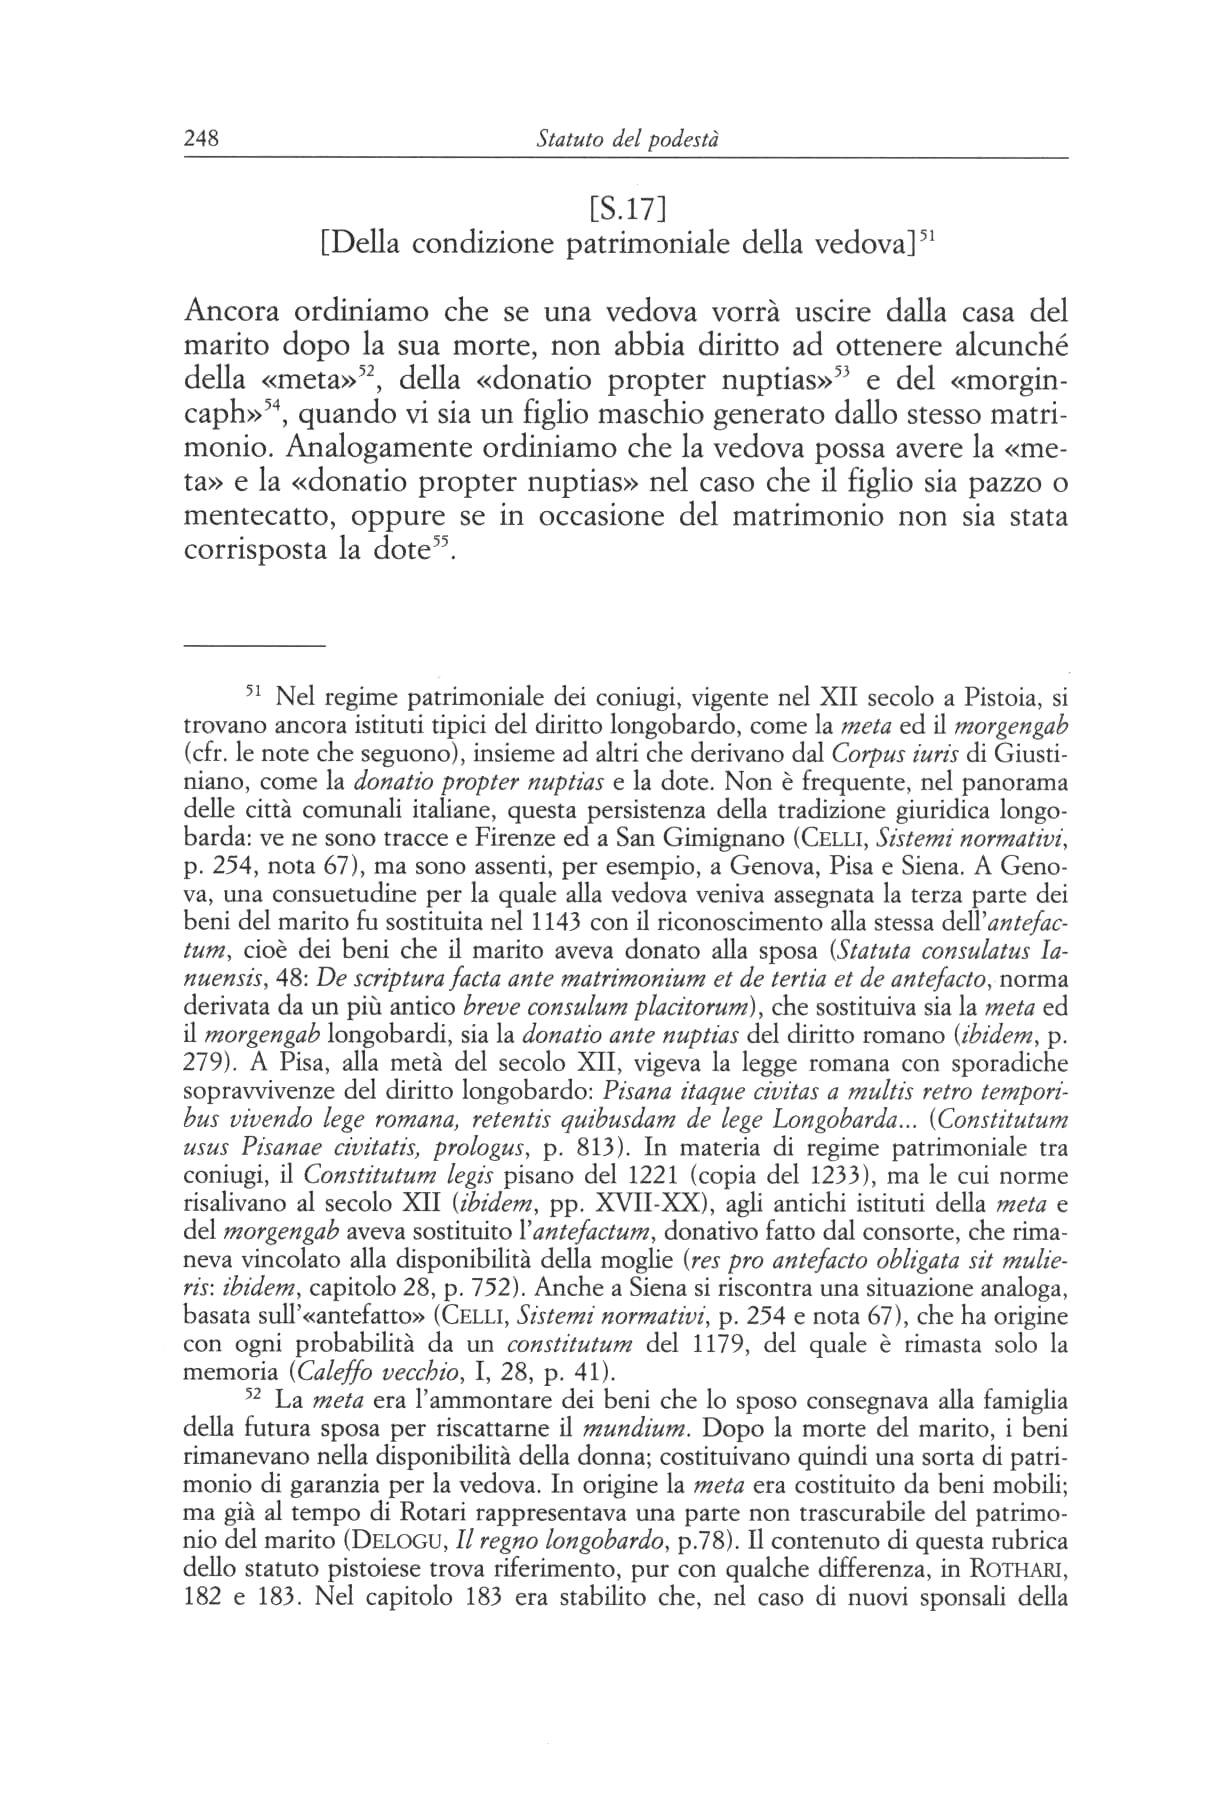 statuti pistoiesi del sec.XII 0248.jpg